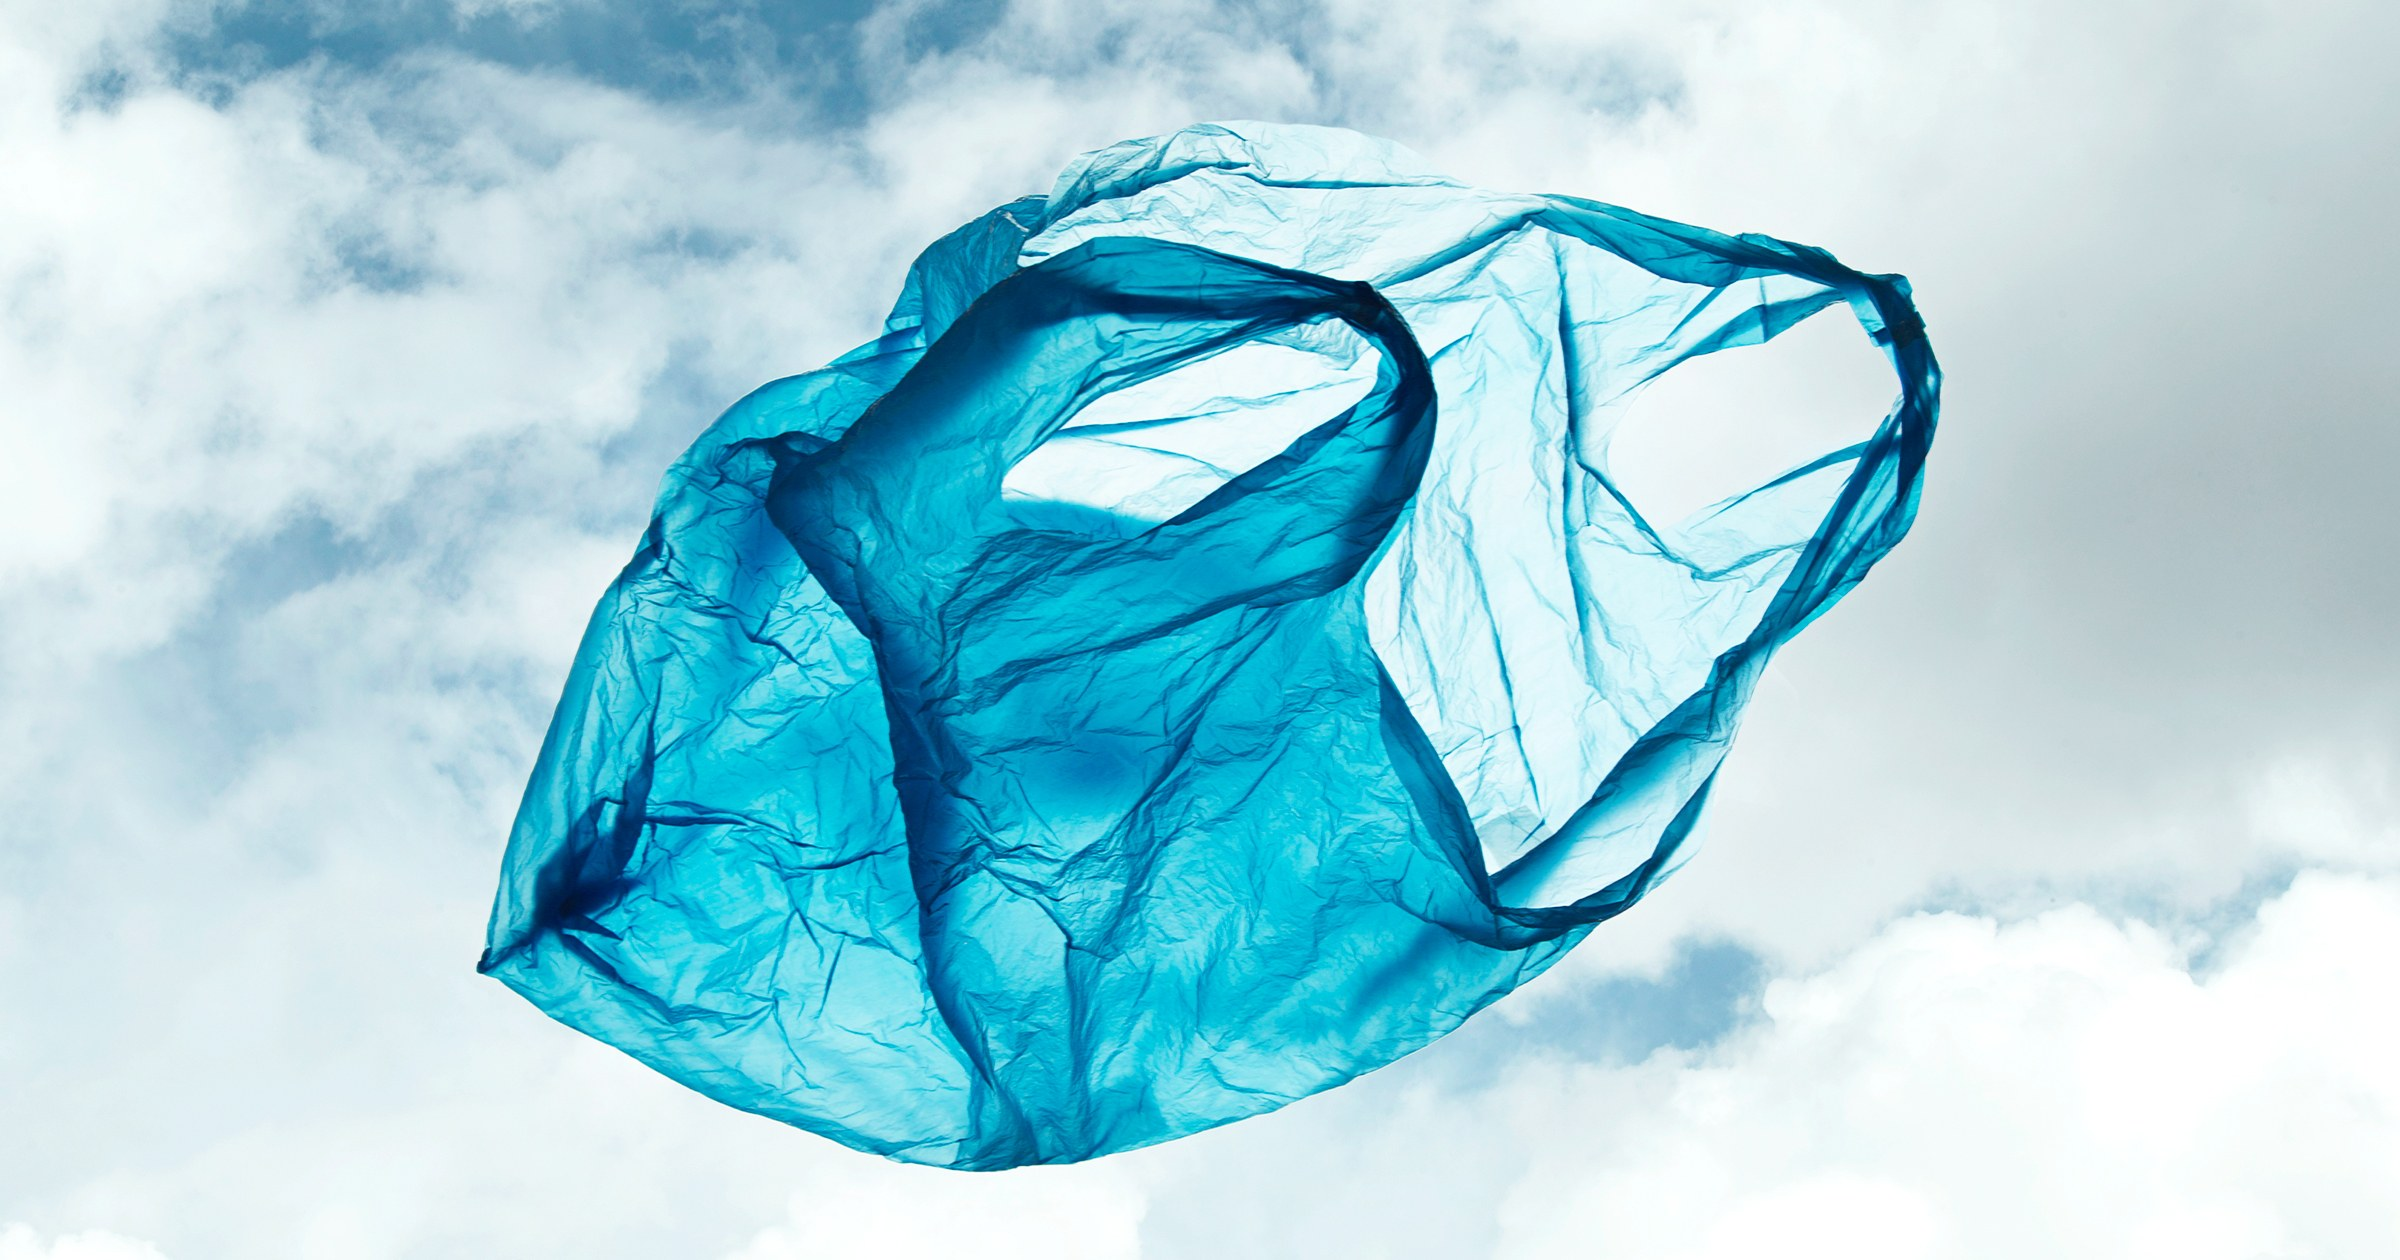 plastic-bag-sb10063890a-001.jpg